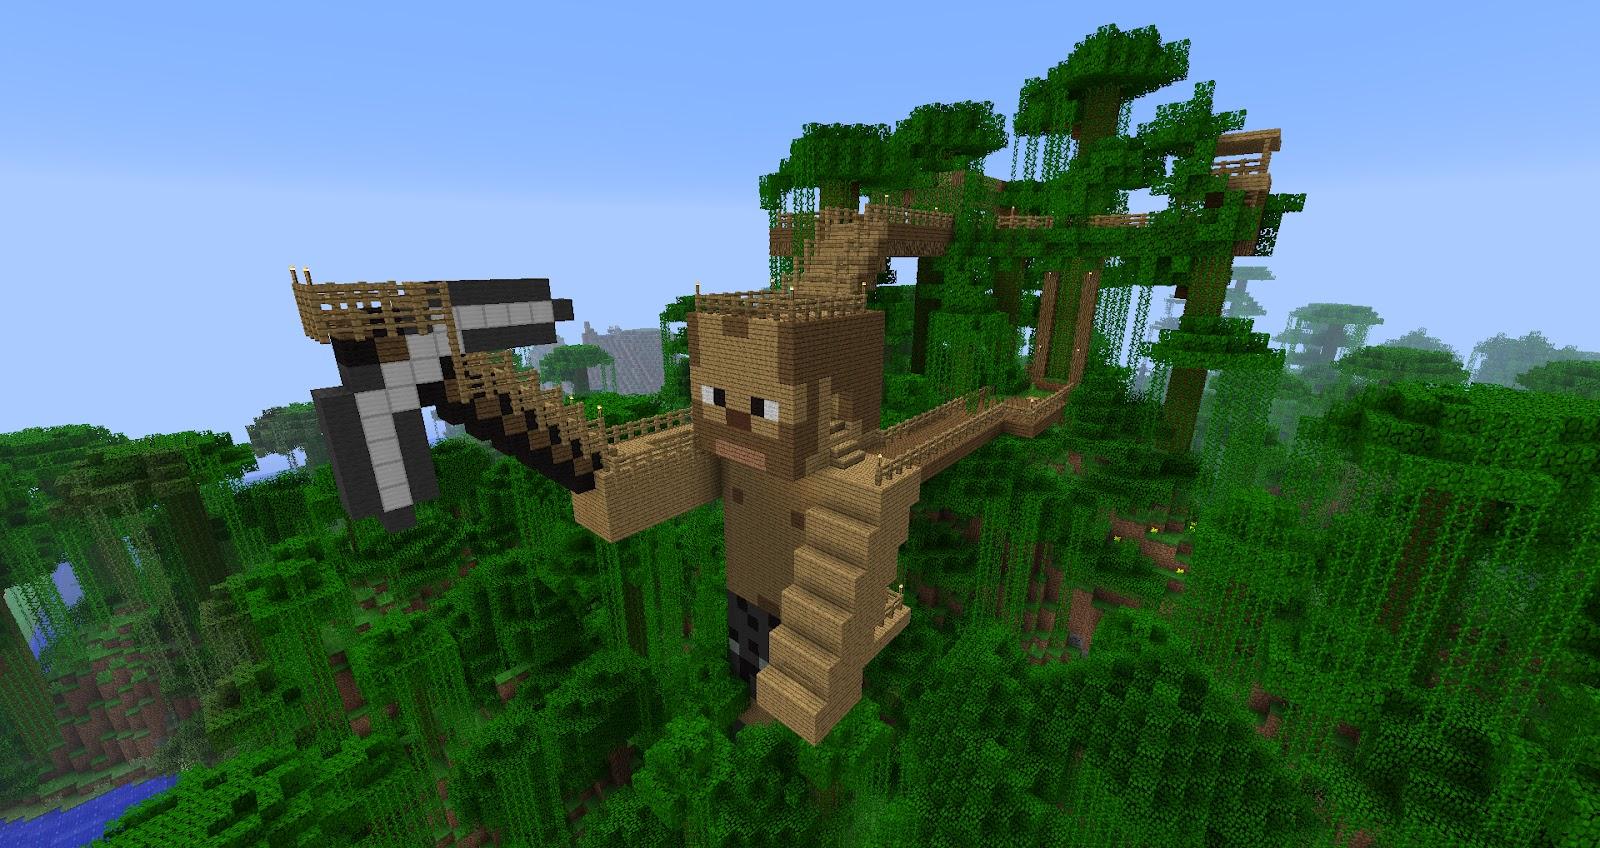 http://2.bp.blogspot.com/-FAEDgpHDpIc/T736qIEiNbI/AAAAAAAABWc/Wpxx3fYE000/s1600/Minecraft_epic_treehouse.jpg